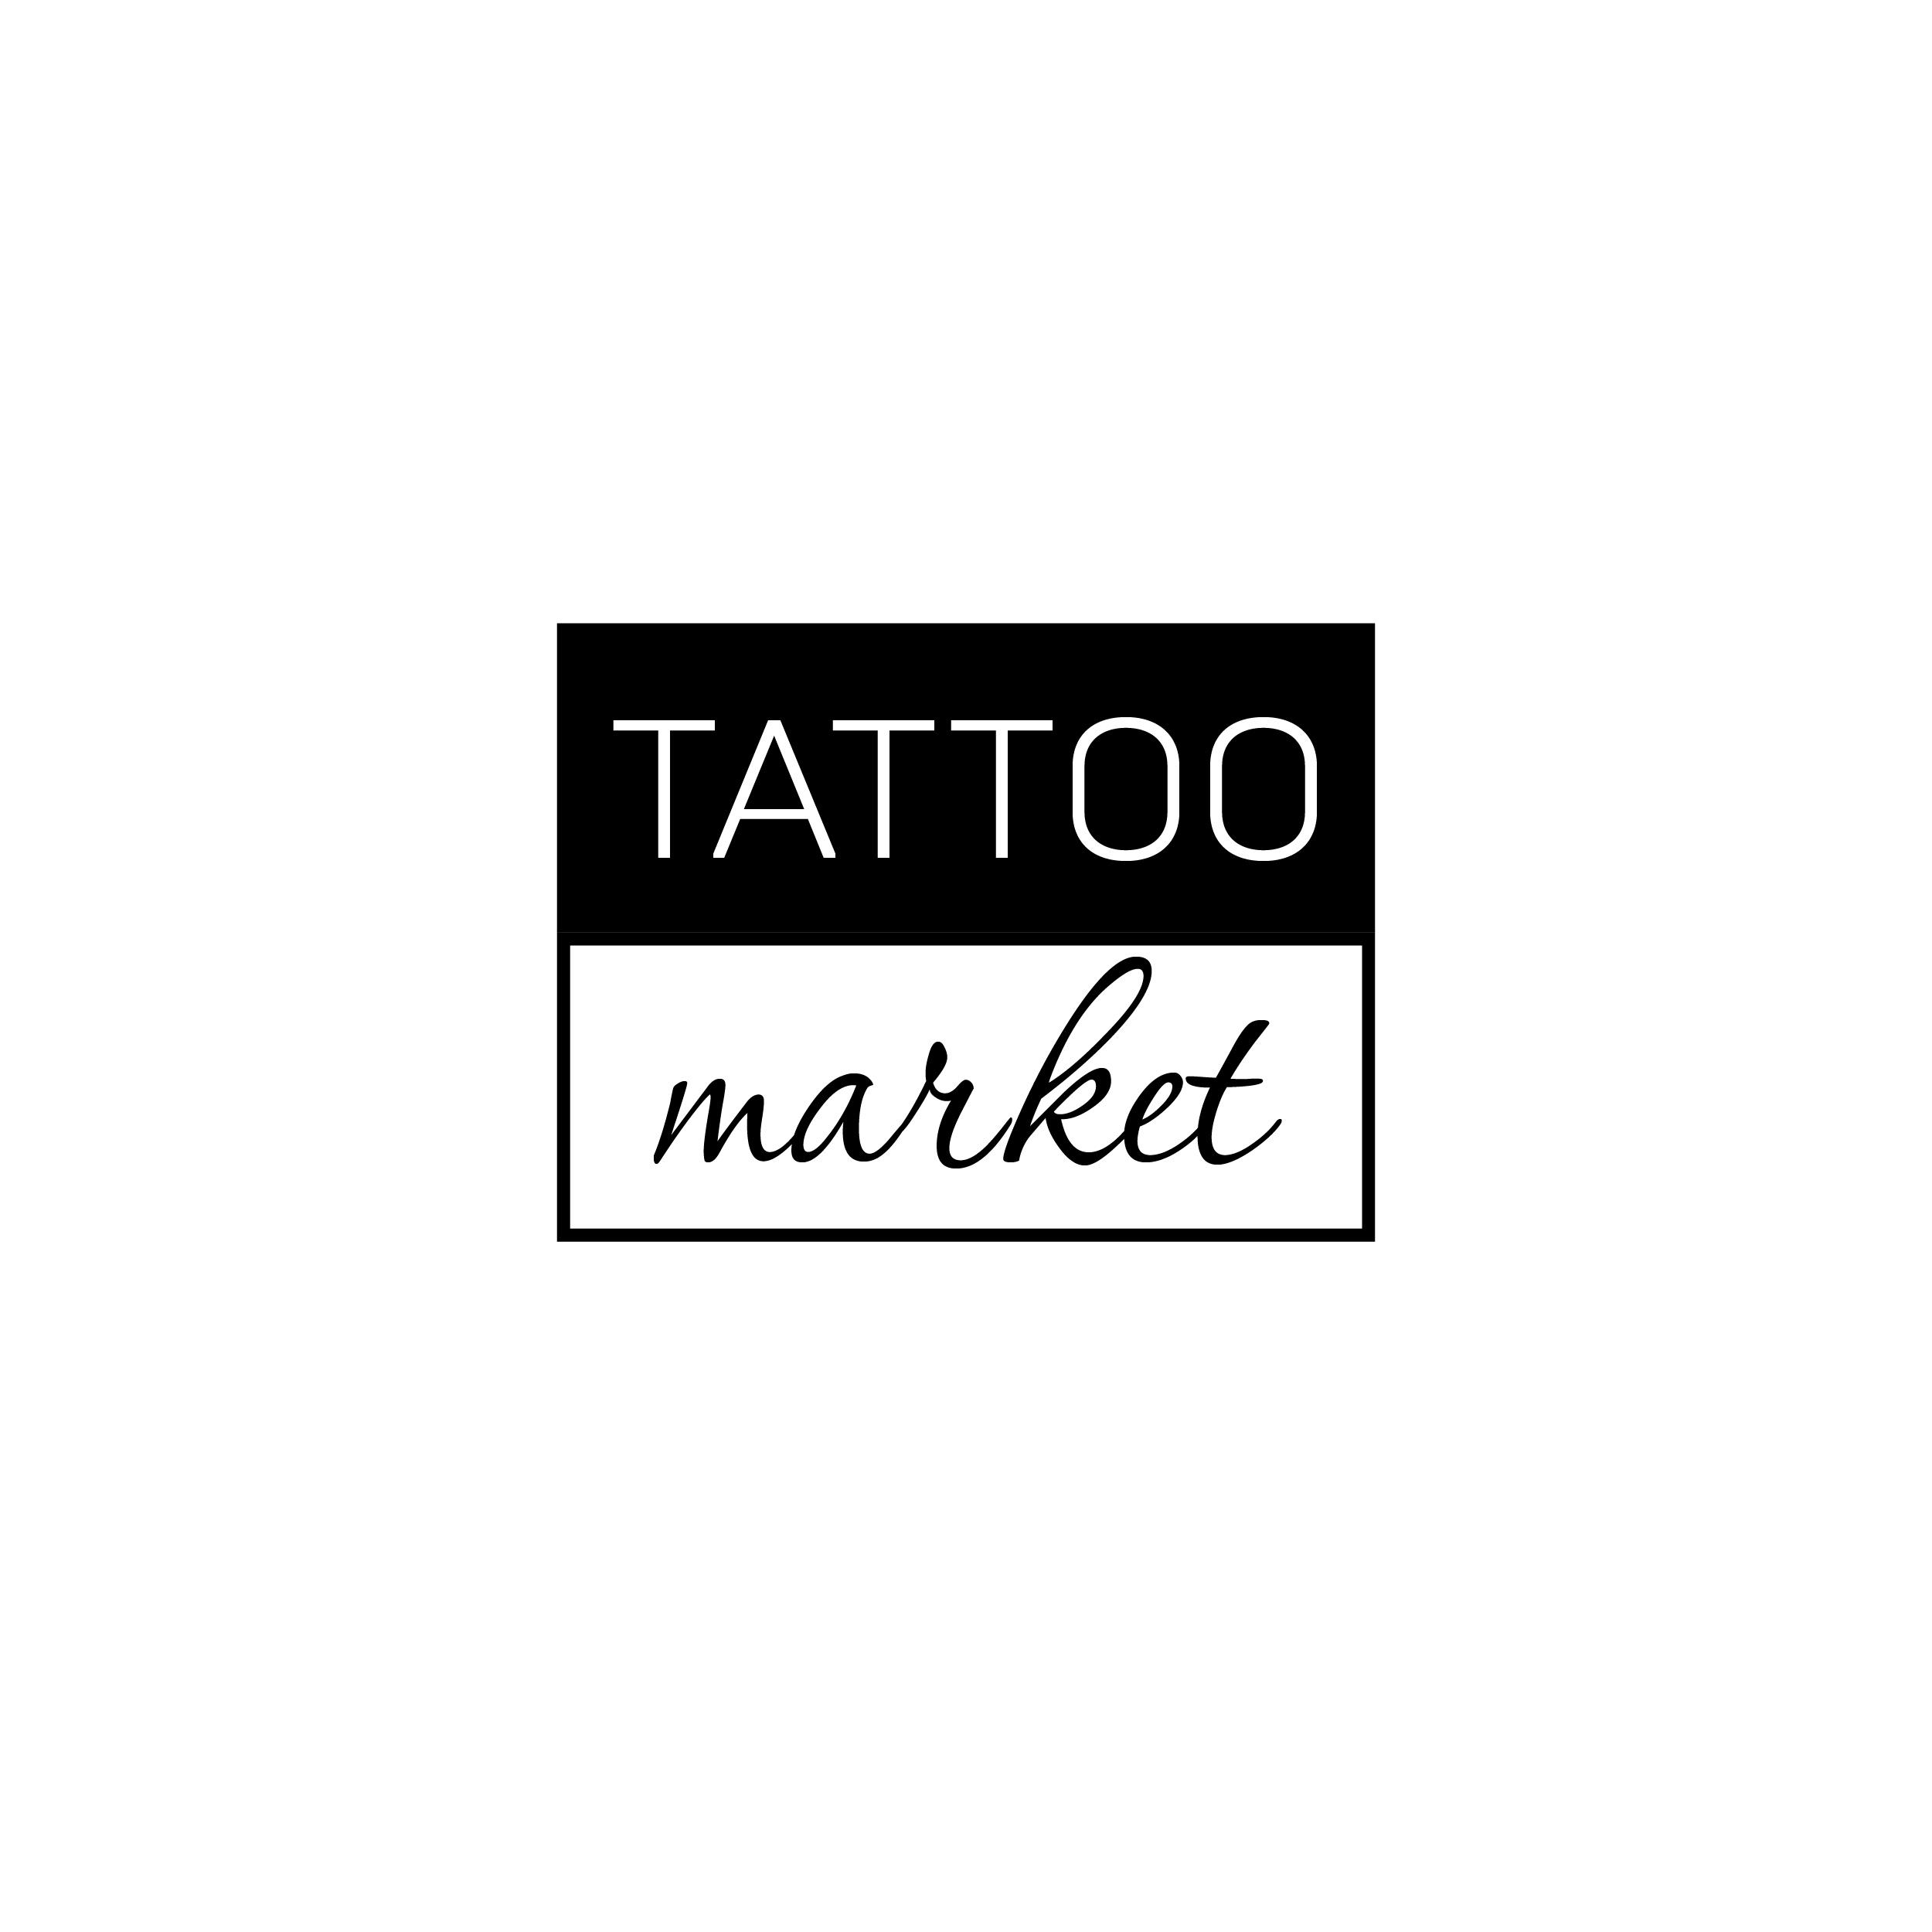 Редизайн логотипа магазина тату оборудования TattooMarket.ru фото f_5925c3b1e643f73d.jpg